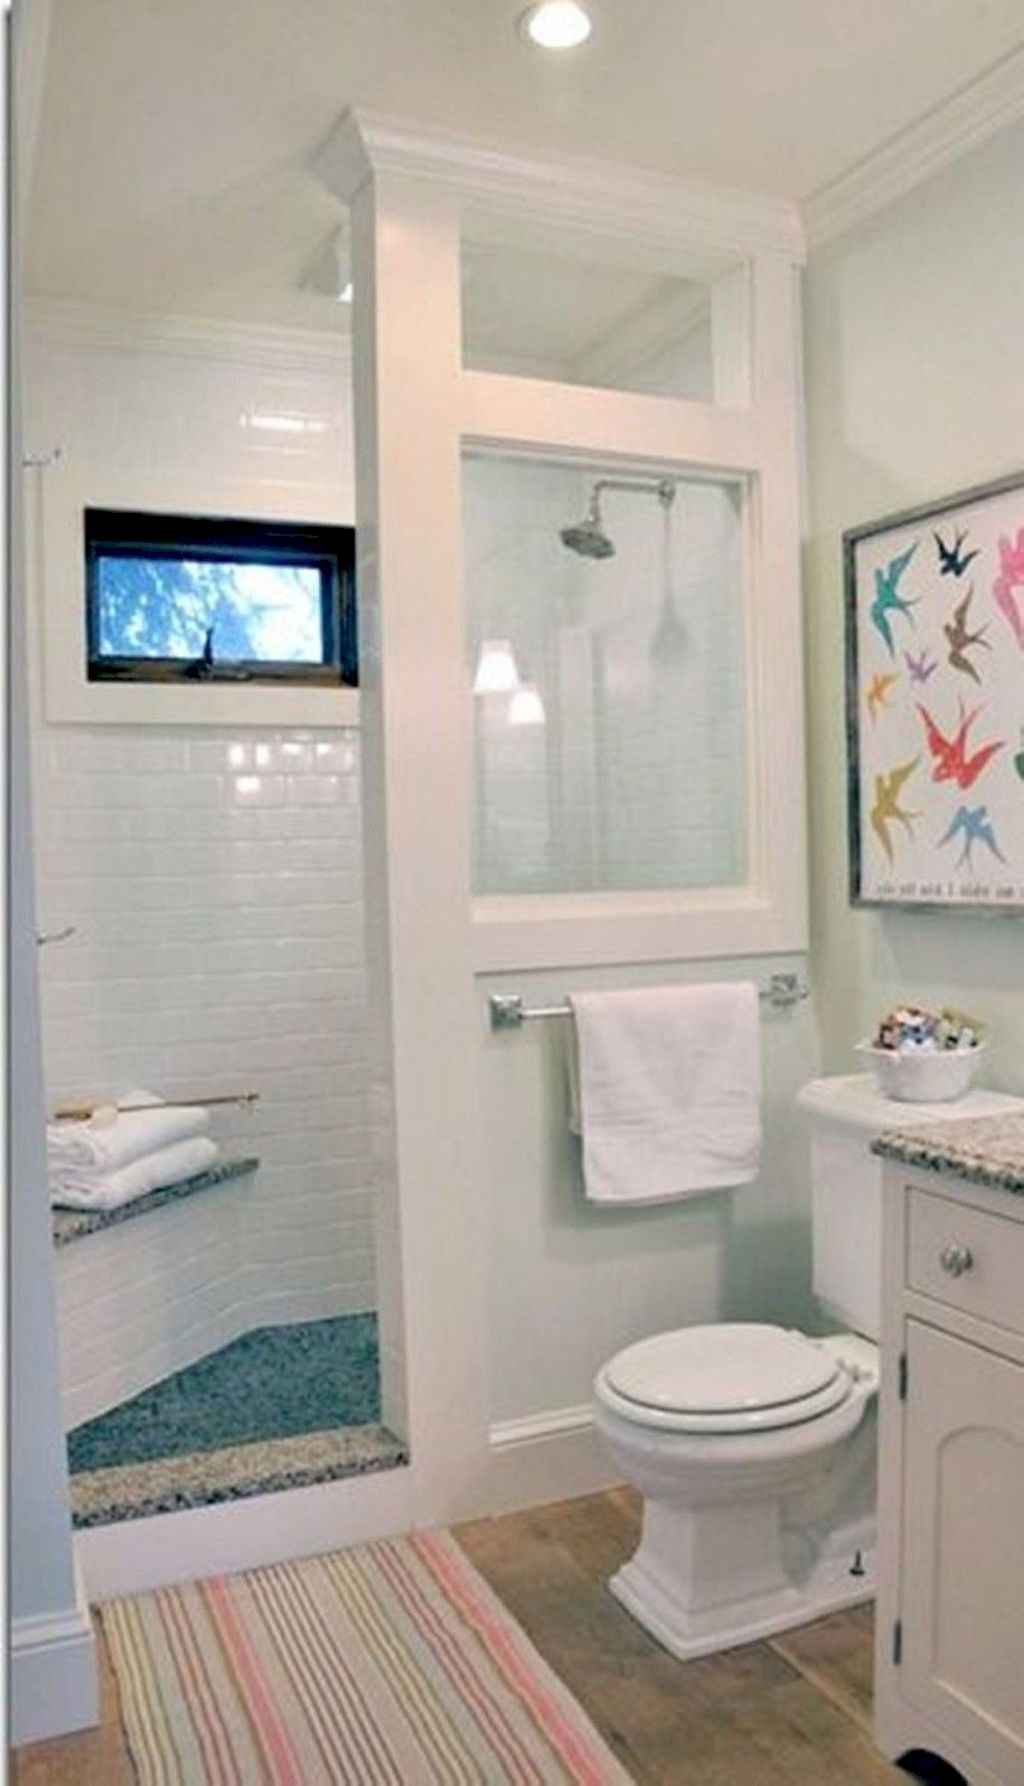 111 Brilliant Small Bathroom Remodel Ideas On A Budget (106)